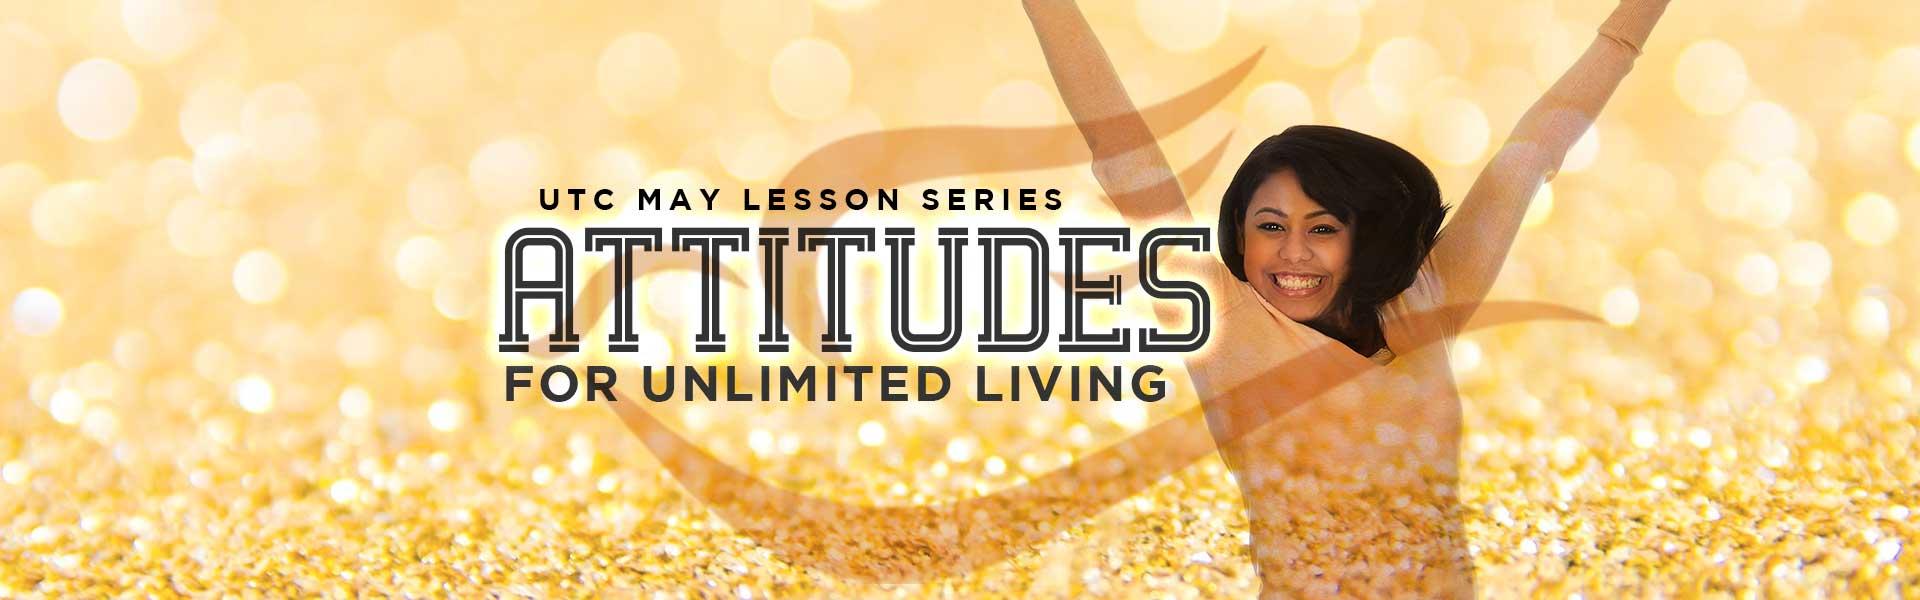 Attitudes-May2018-banner